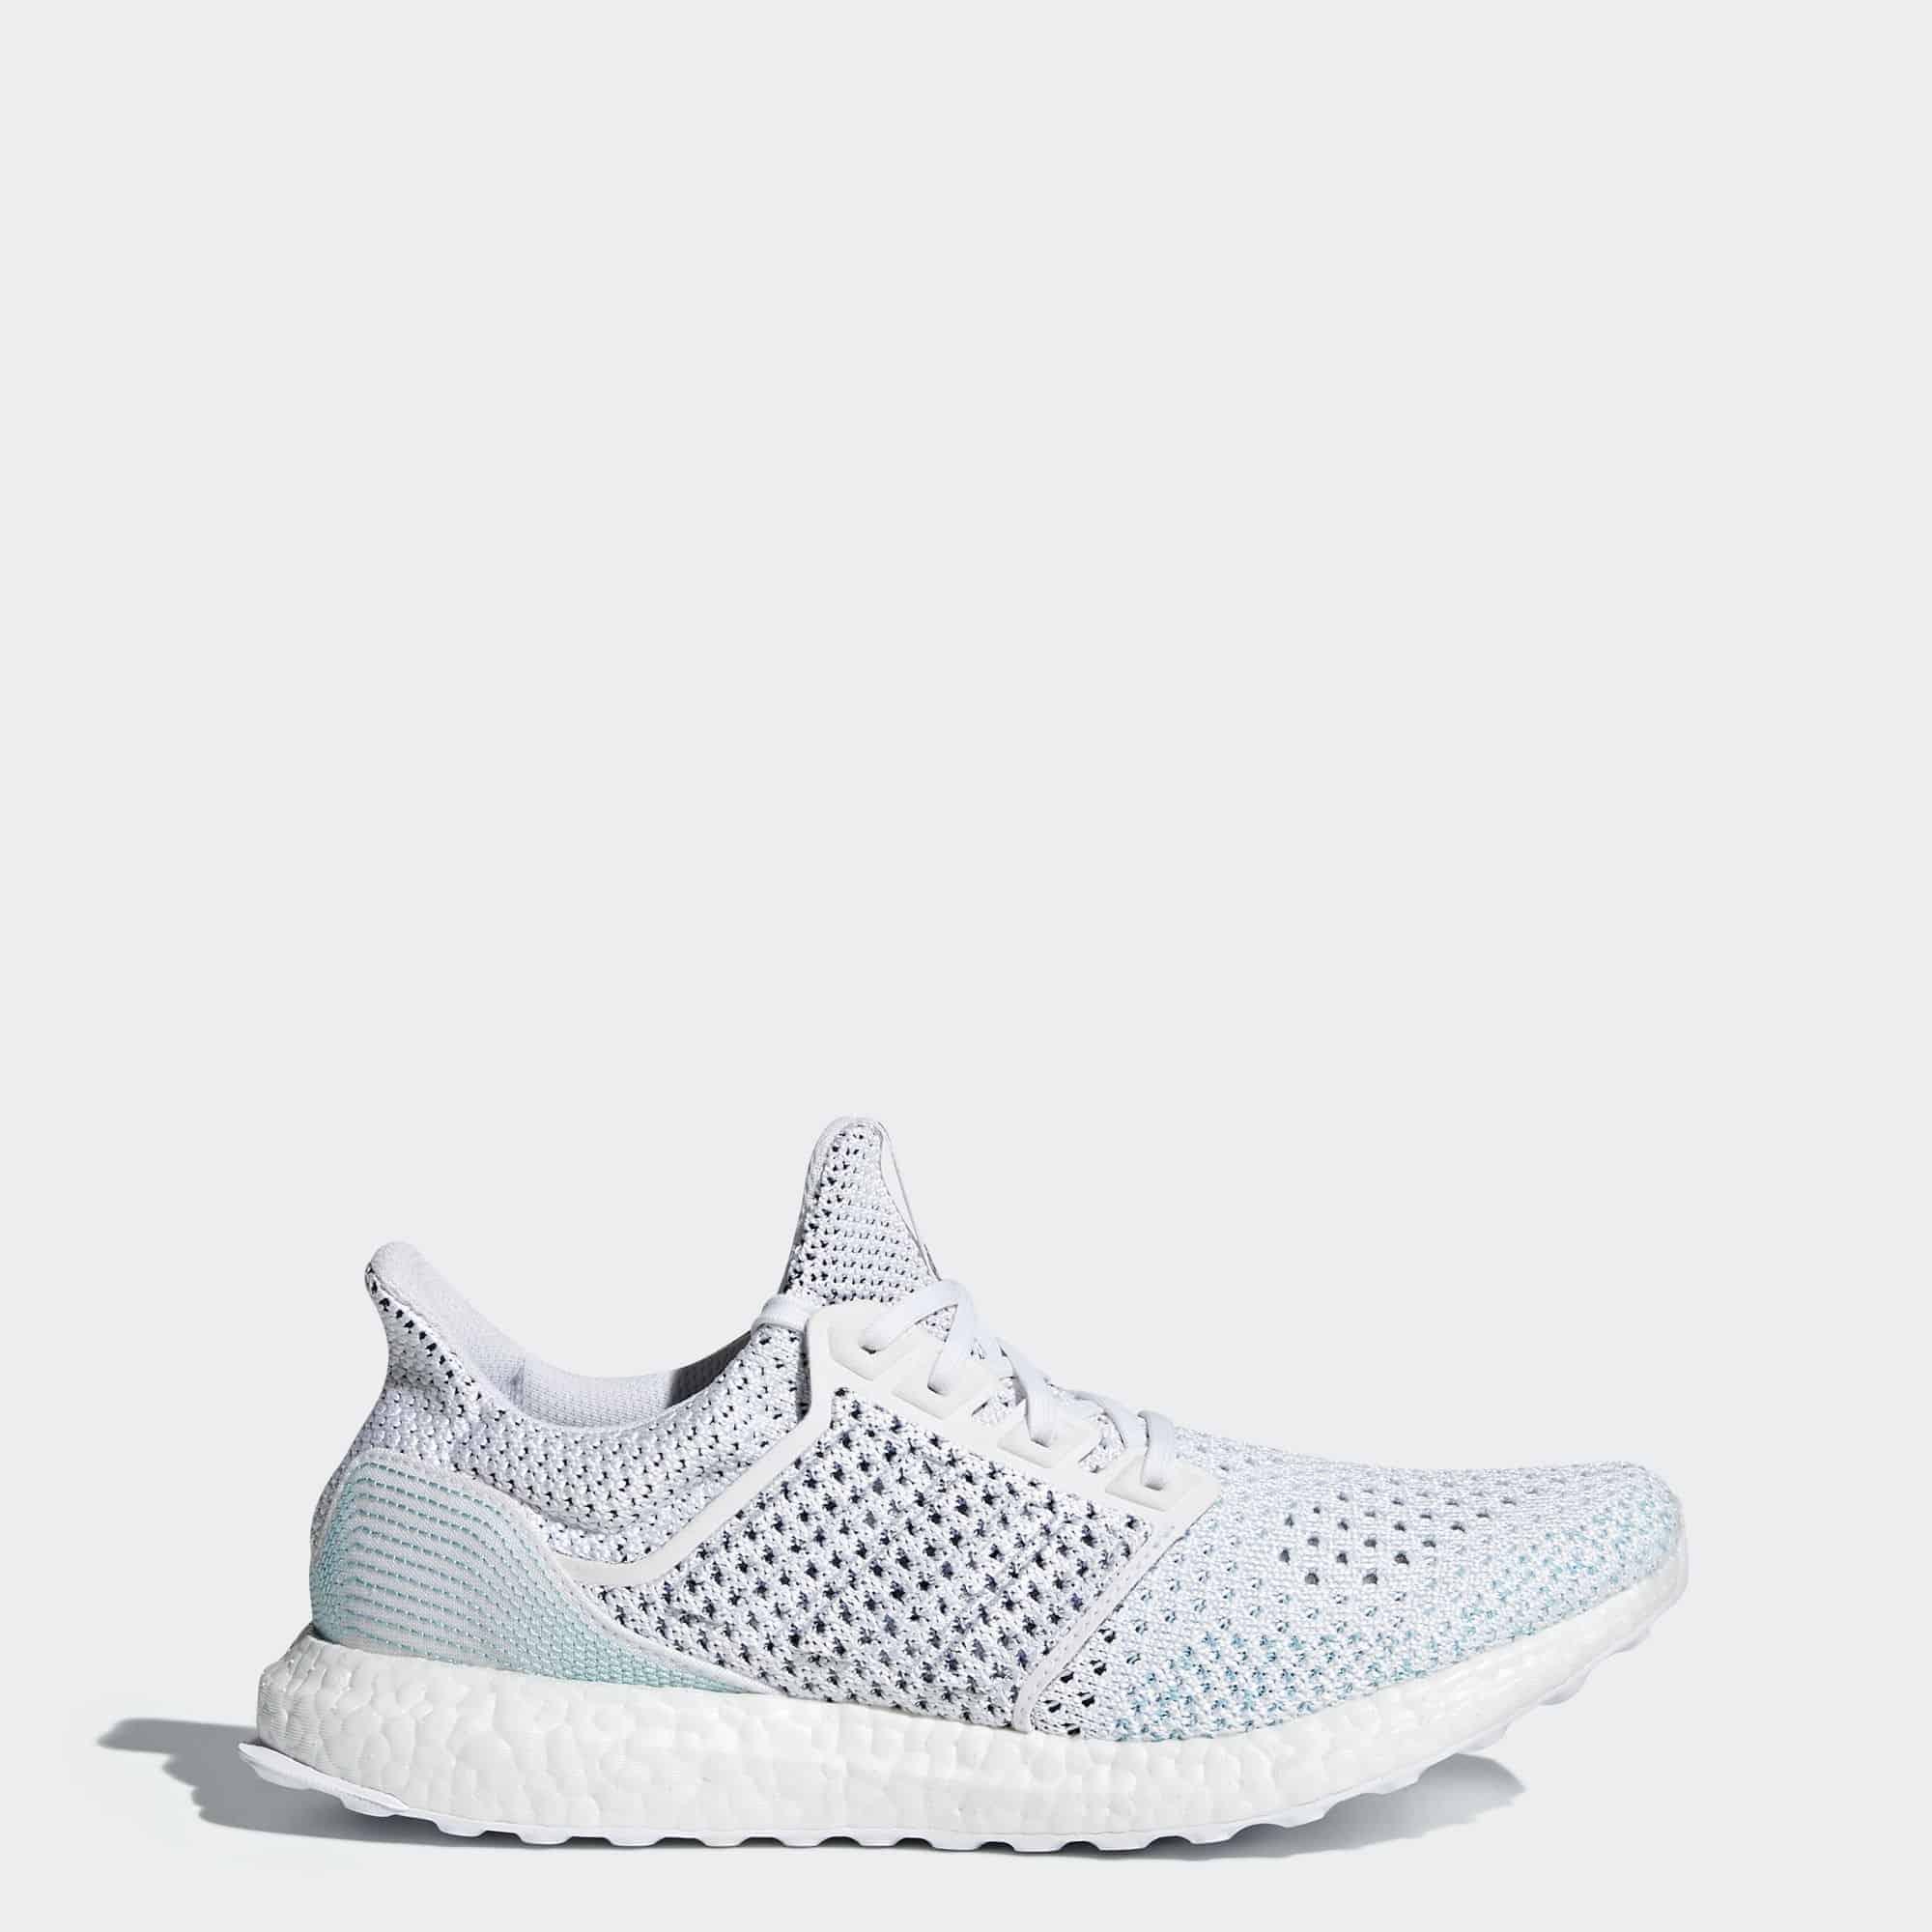 Кроссовки для бега Adidas Ultraboost Parley LTD мужские